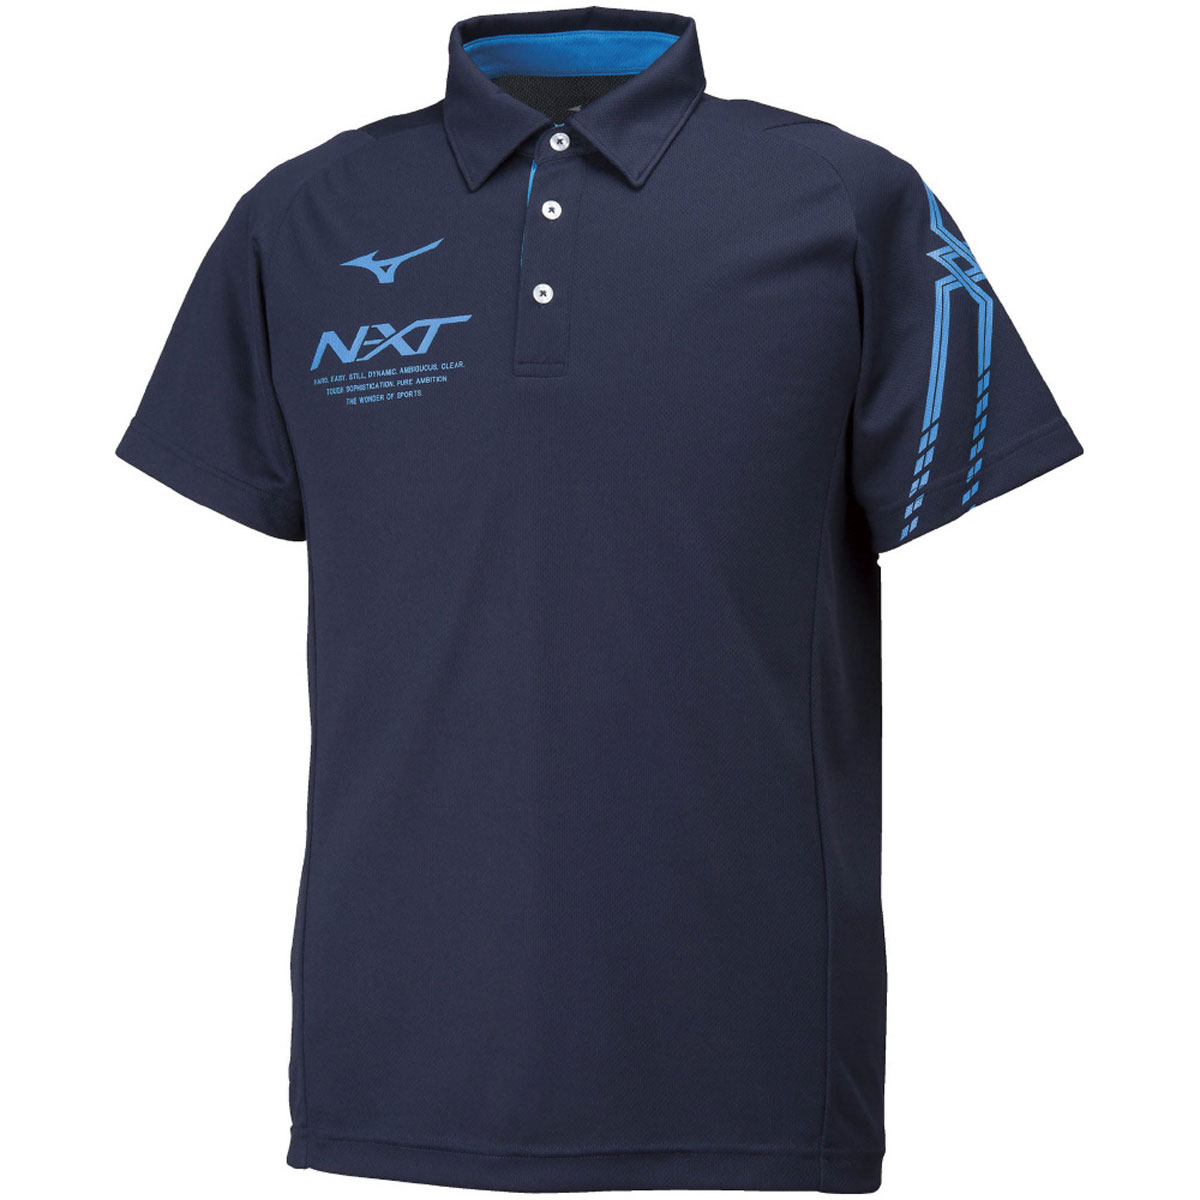 N-XT 半袖ポロシャツ